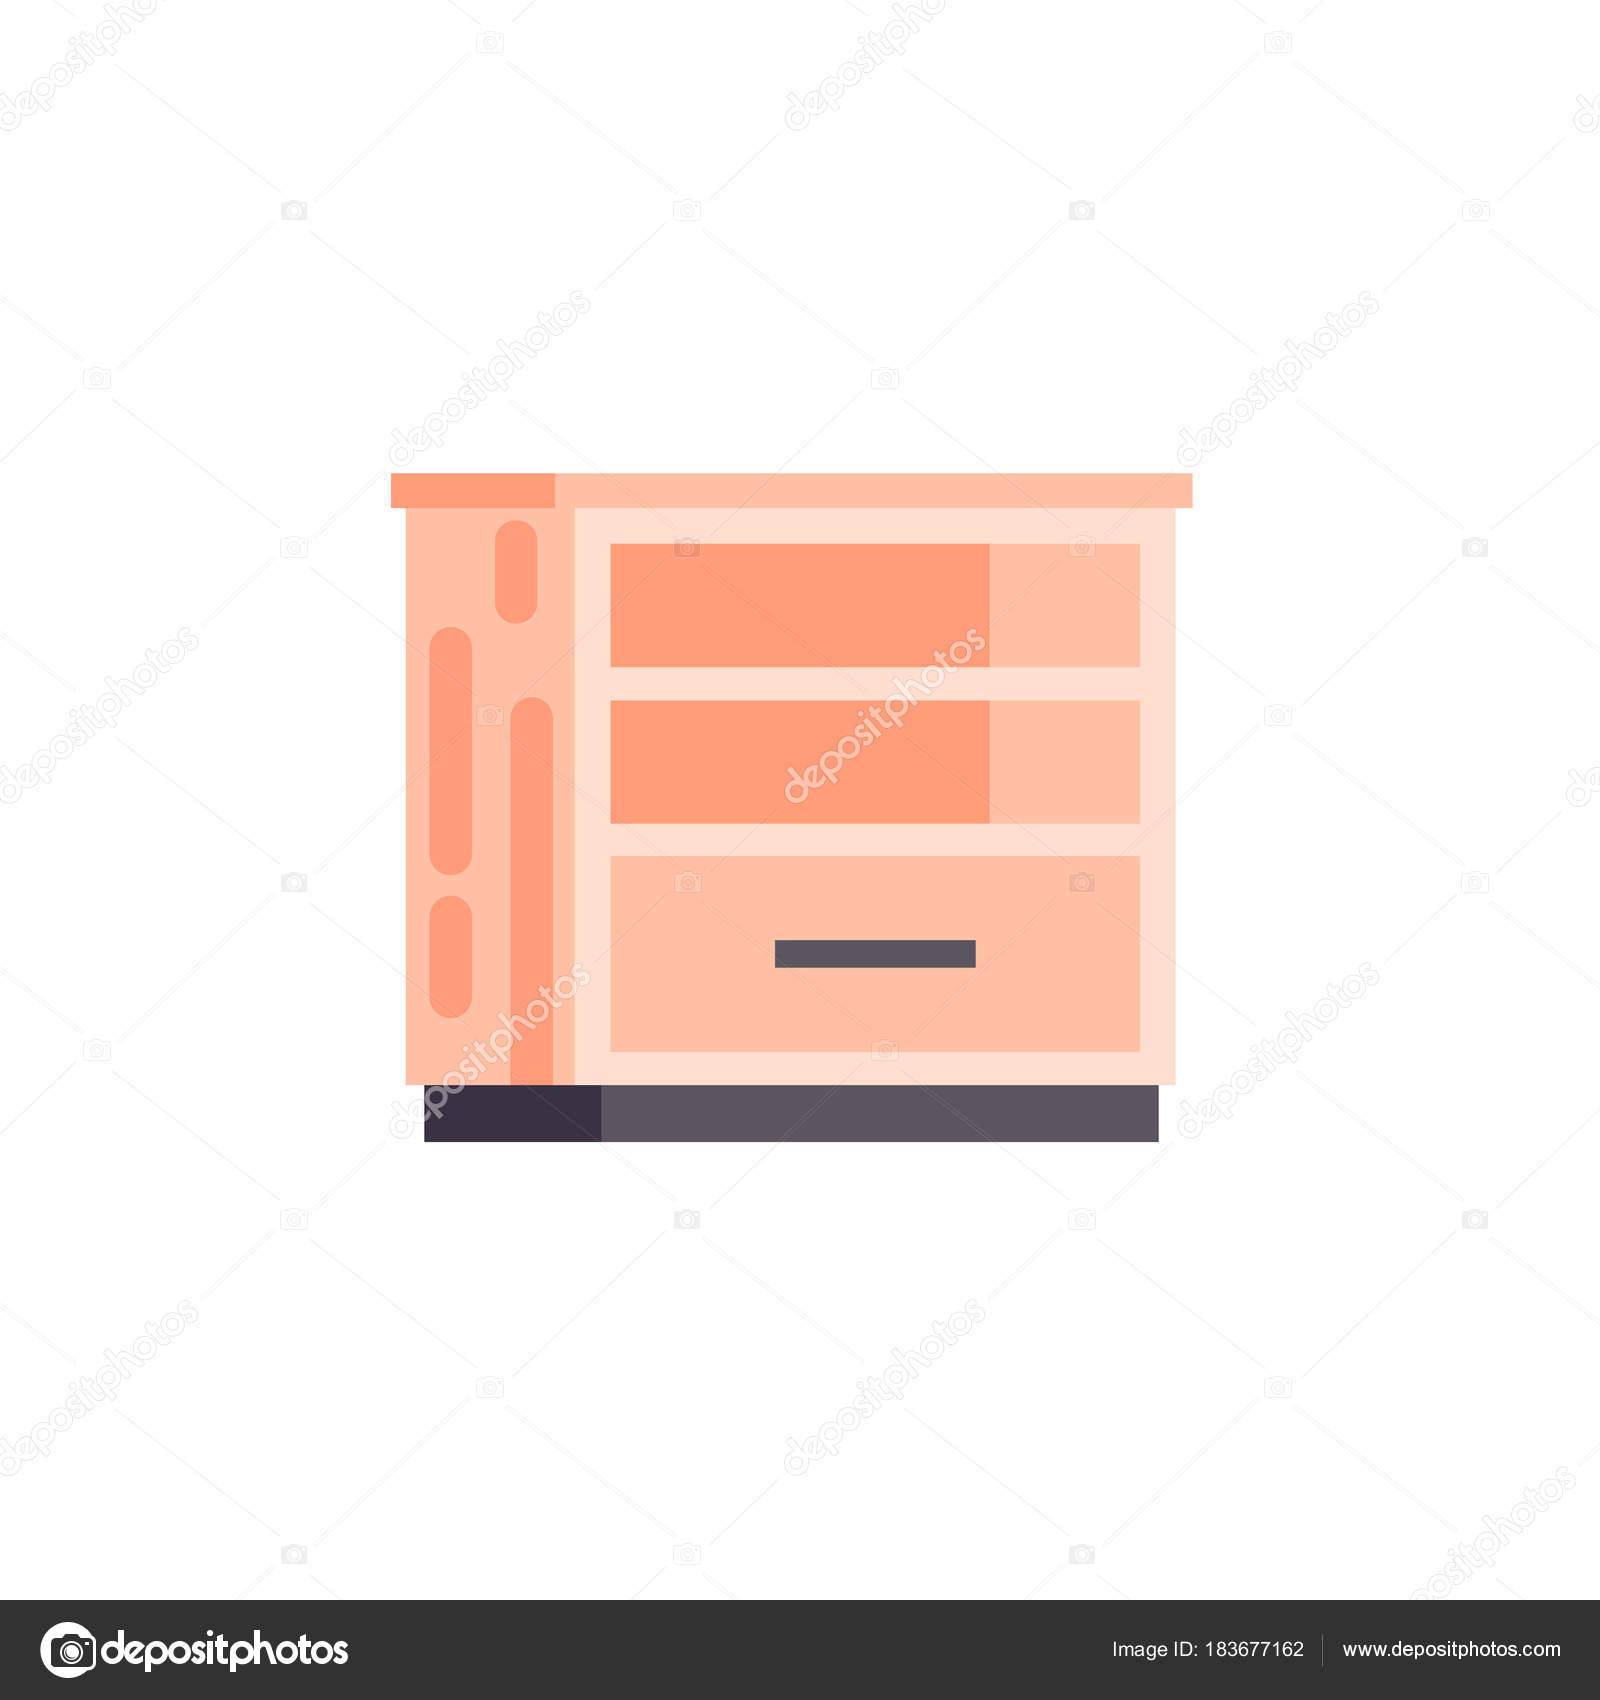 Möbel Leer vektor isolierte abbildung symbol möbel leer orange nachttisch